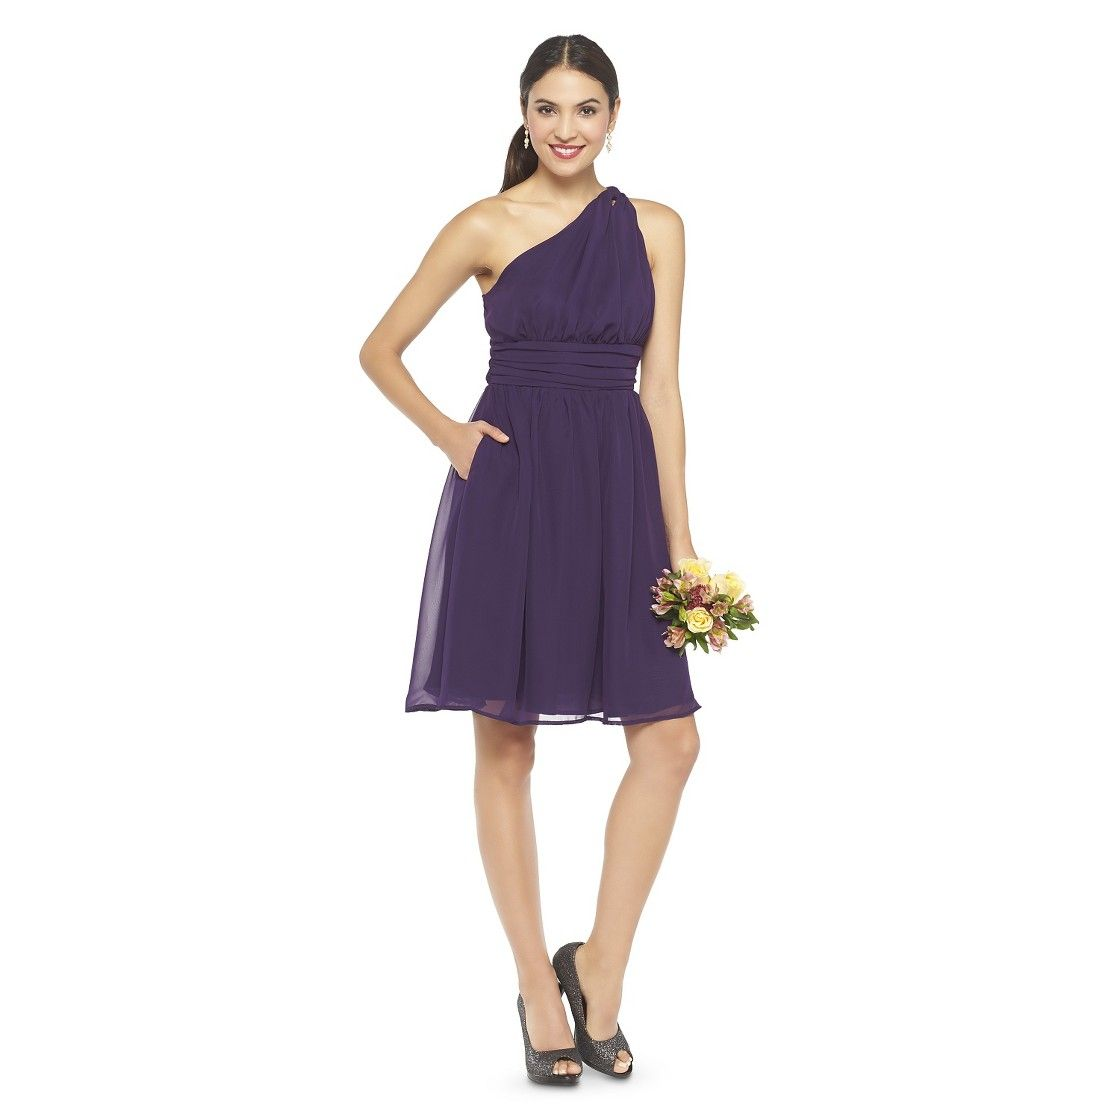 Women\'s One Shoulder Chiffon Bridesmaid Dress - TEVOLIO™ | Purple ...